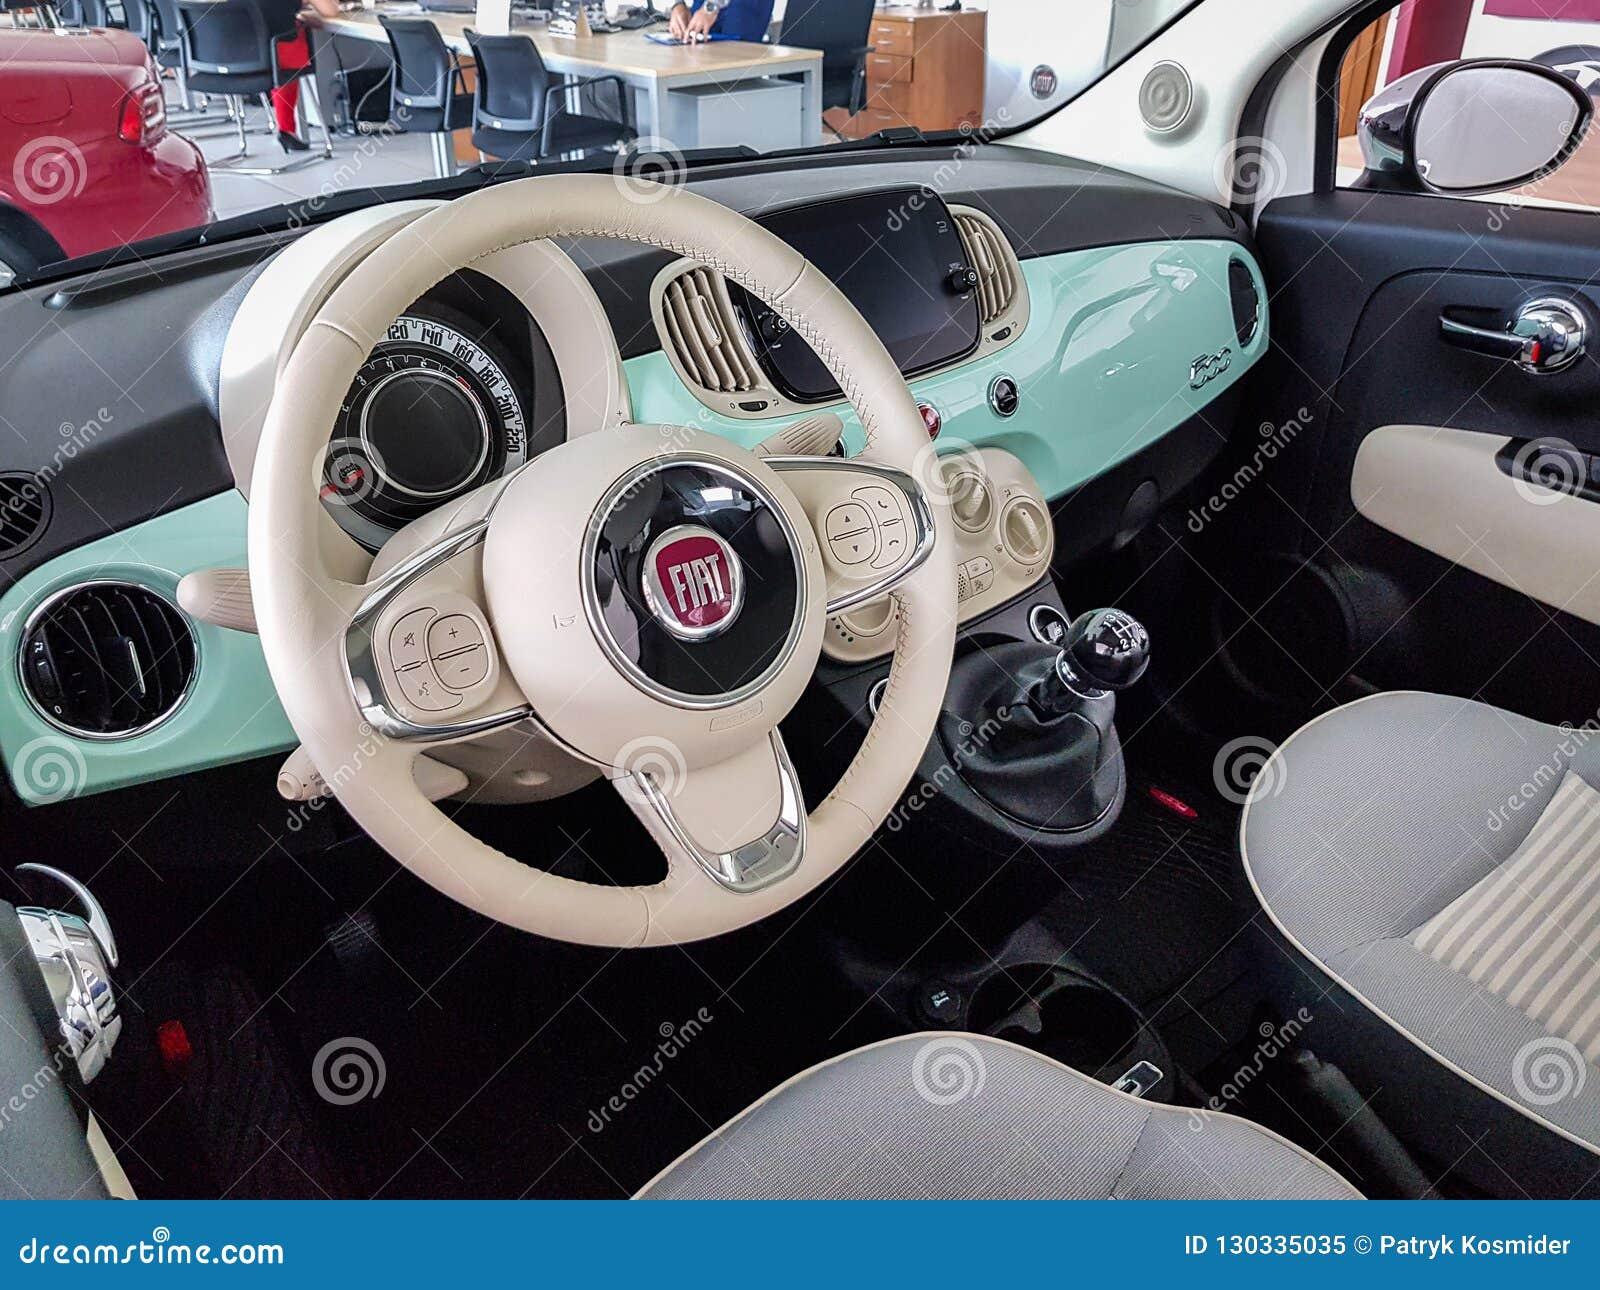 125 Carro Moderno Pequeno De Fiat 500 Fotos Fotos De Stock Gratuitas E Fotos Royalty Free Dreamstime